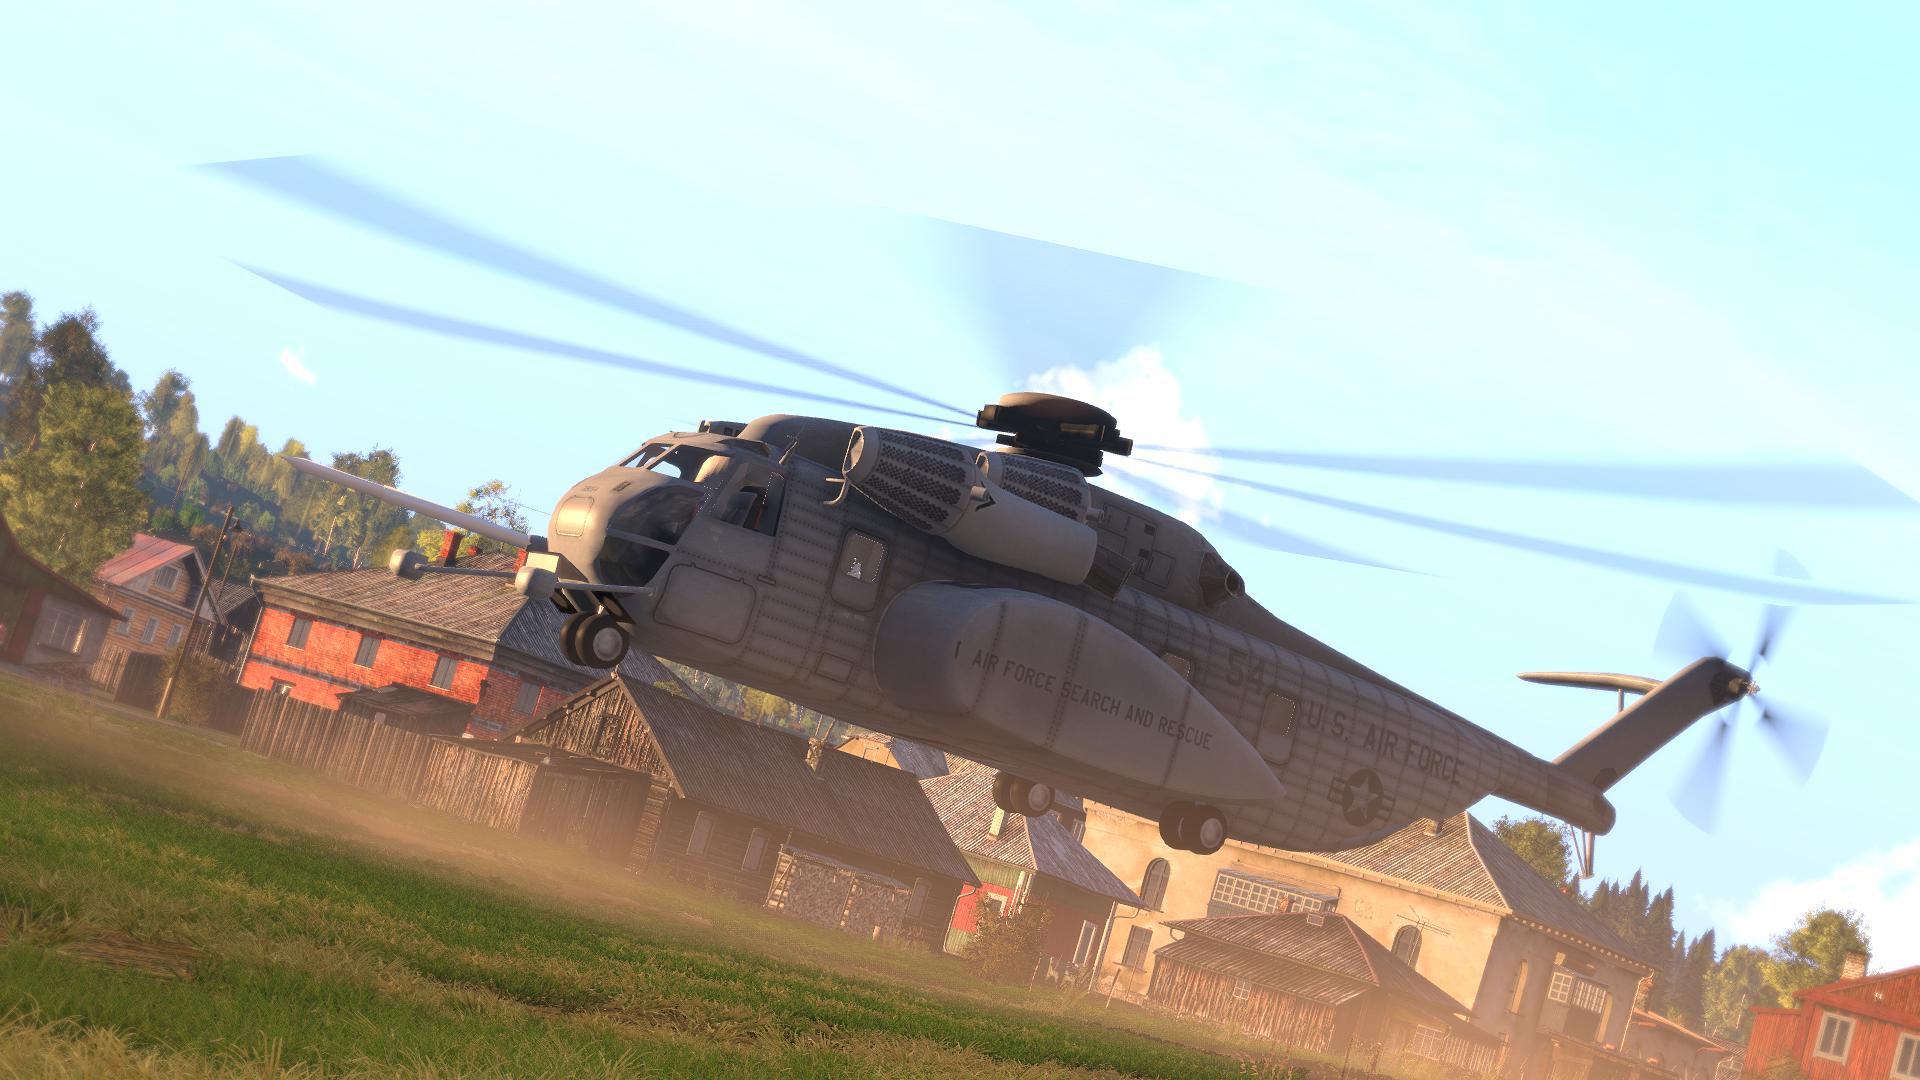 Arma 3 Elicottero : Arma the helicopter of badassery by zeealex on deviantart